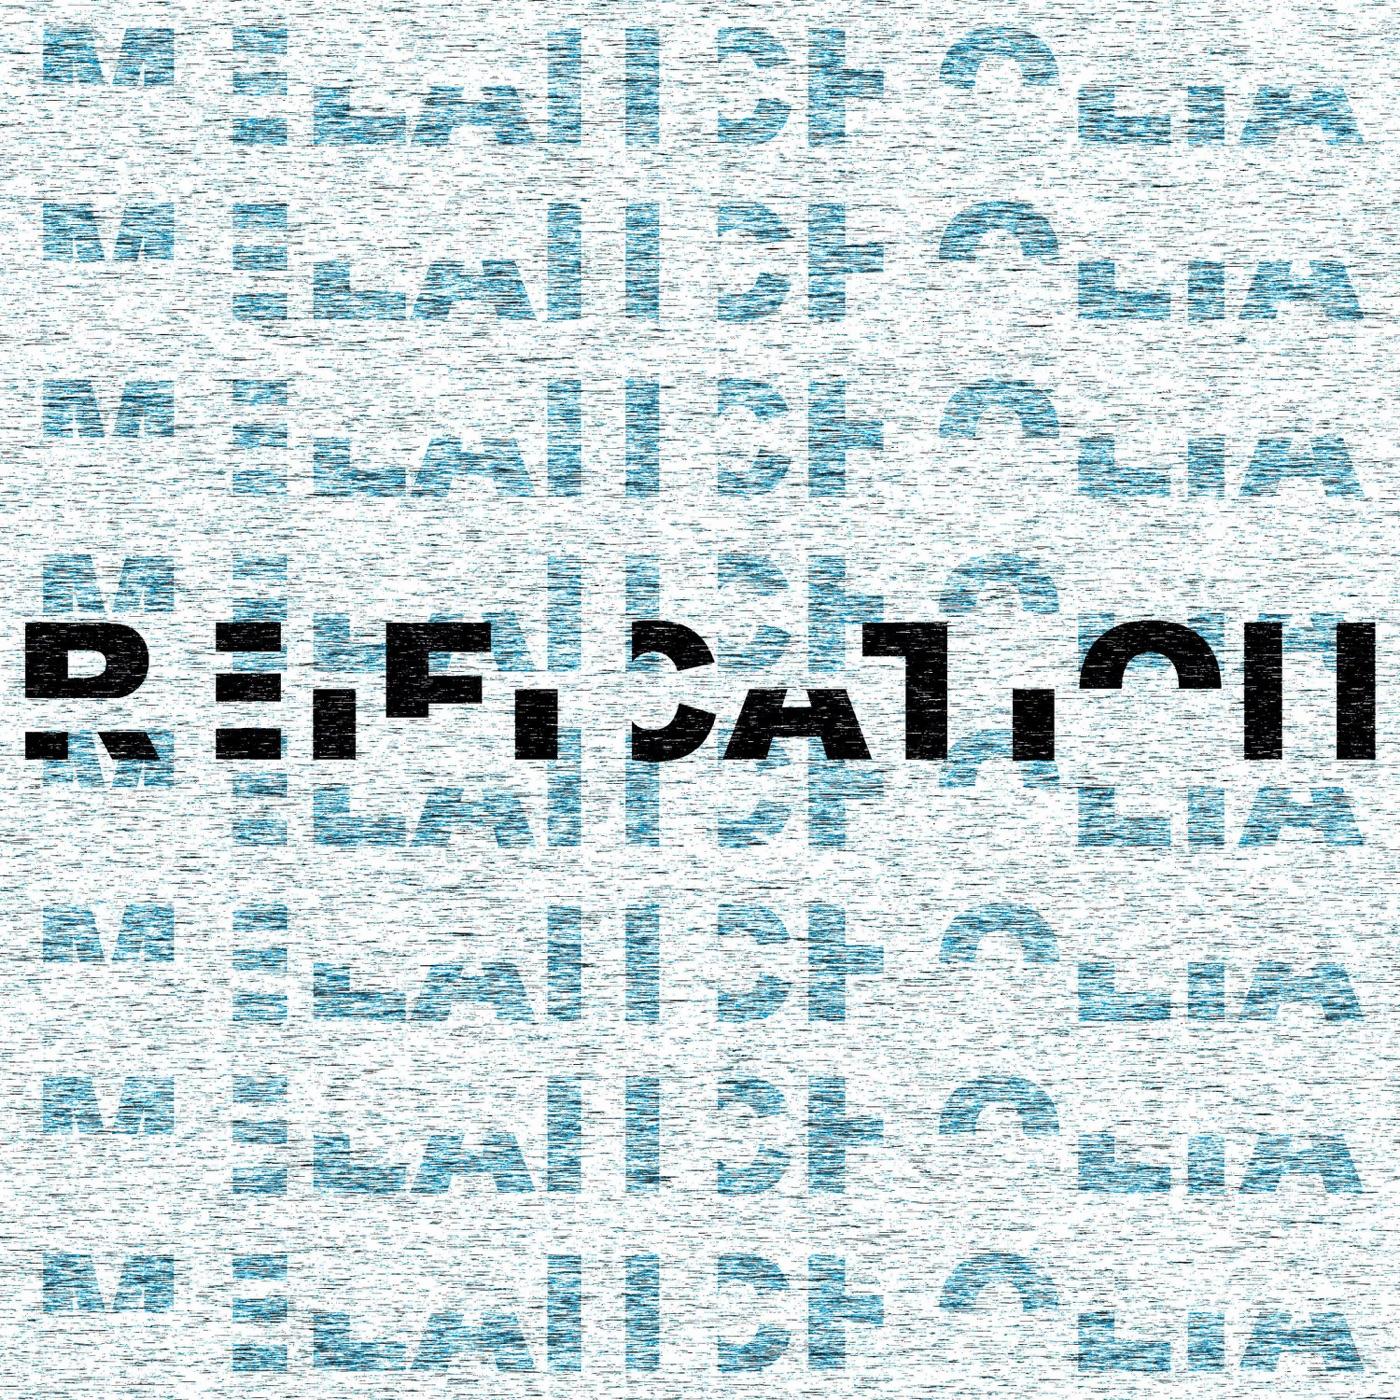 Melancholia - Reification [Single] (2018)